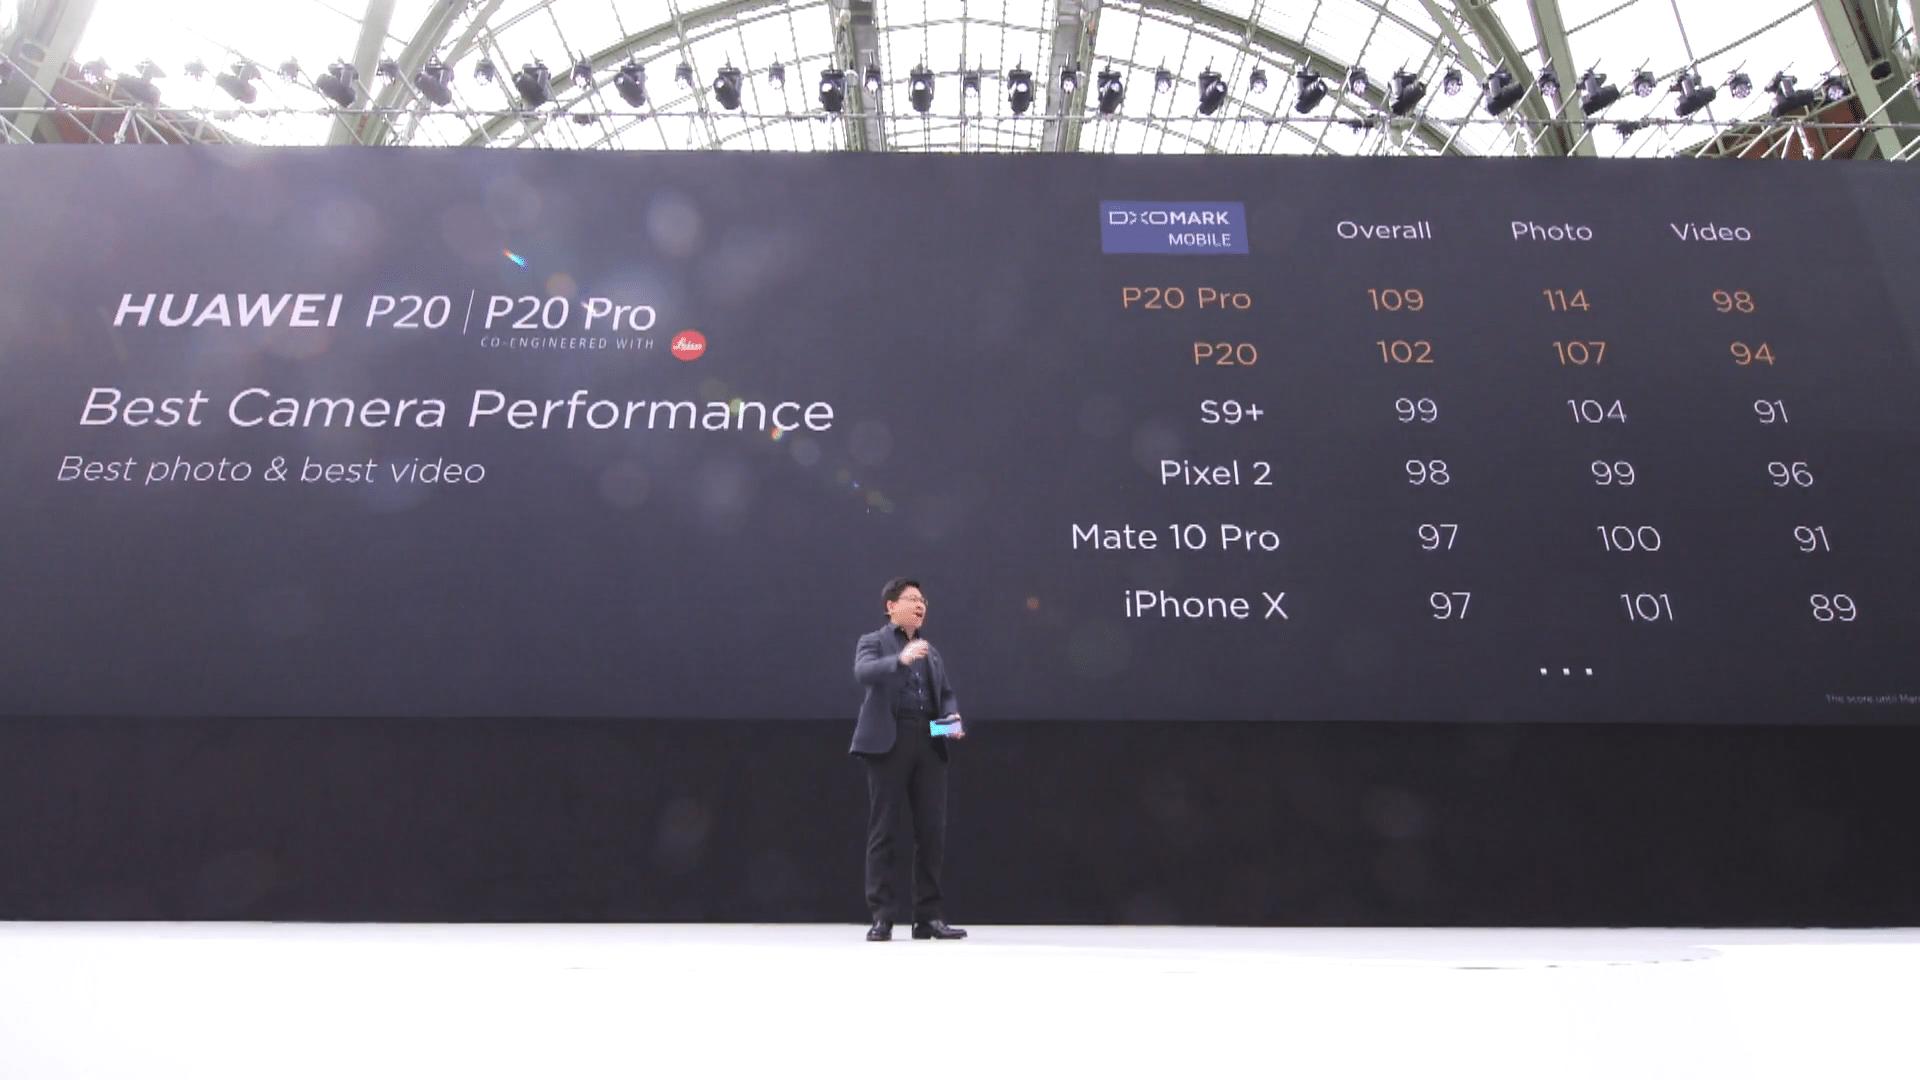 Huawei P20 P20 Pro Camera Performance